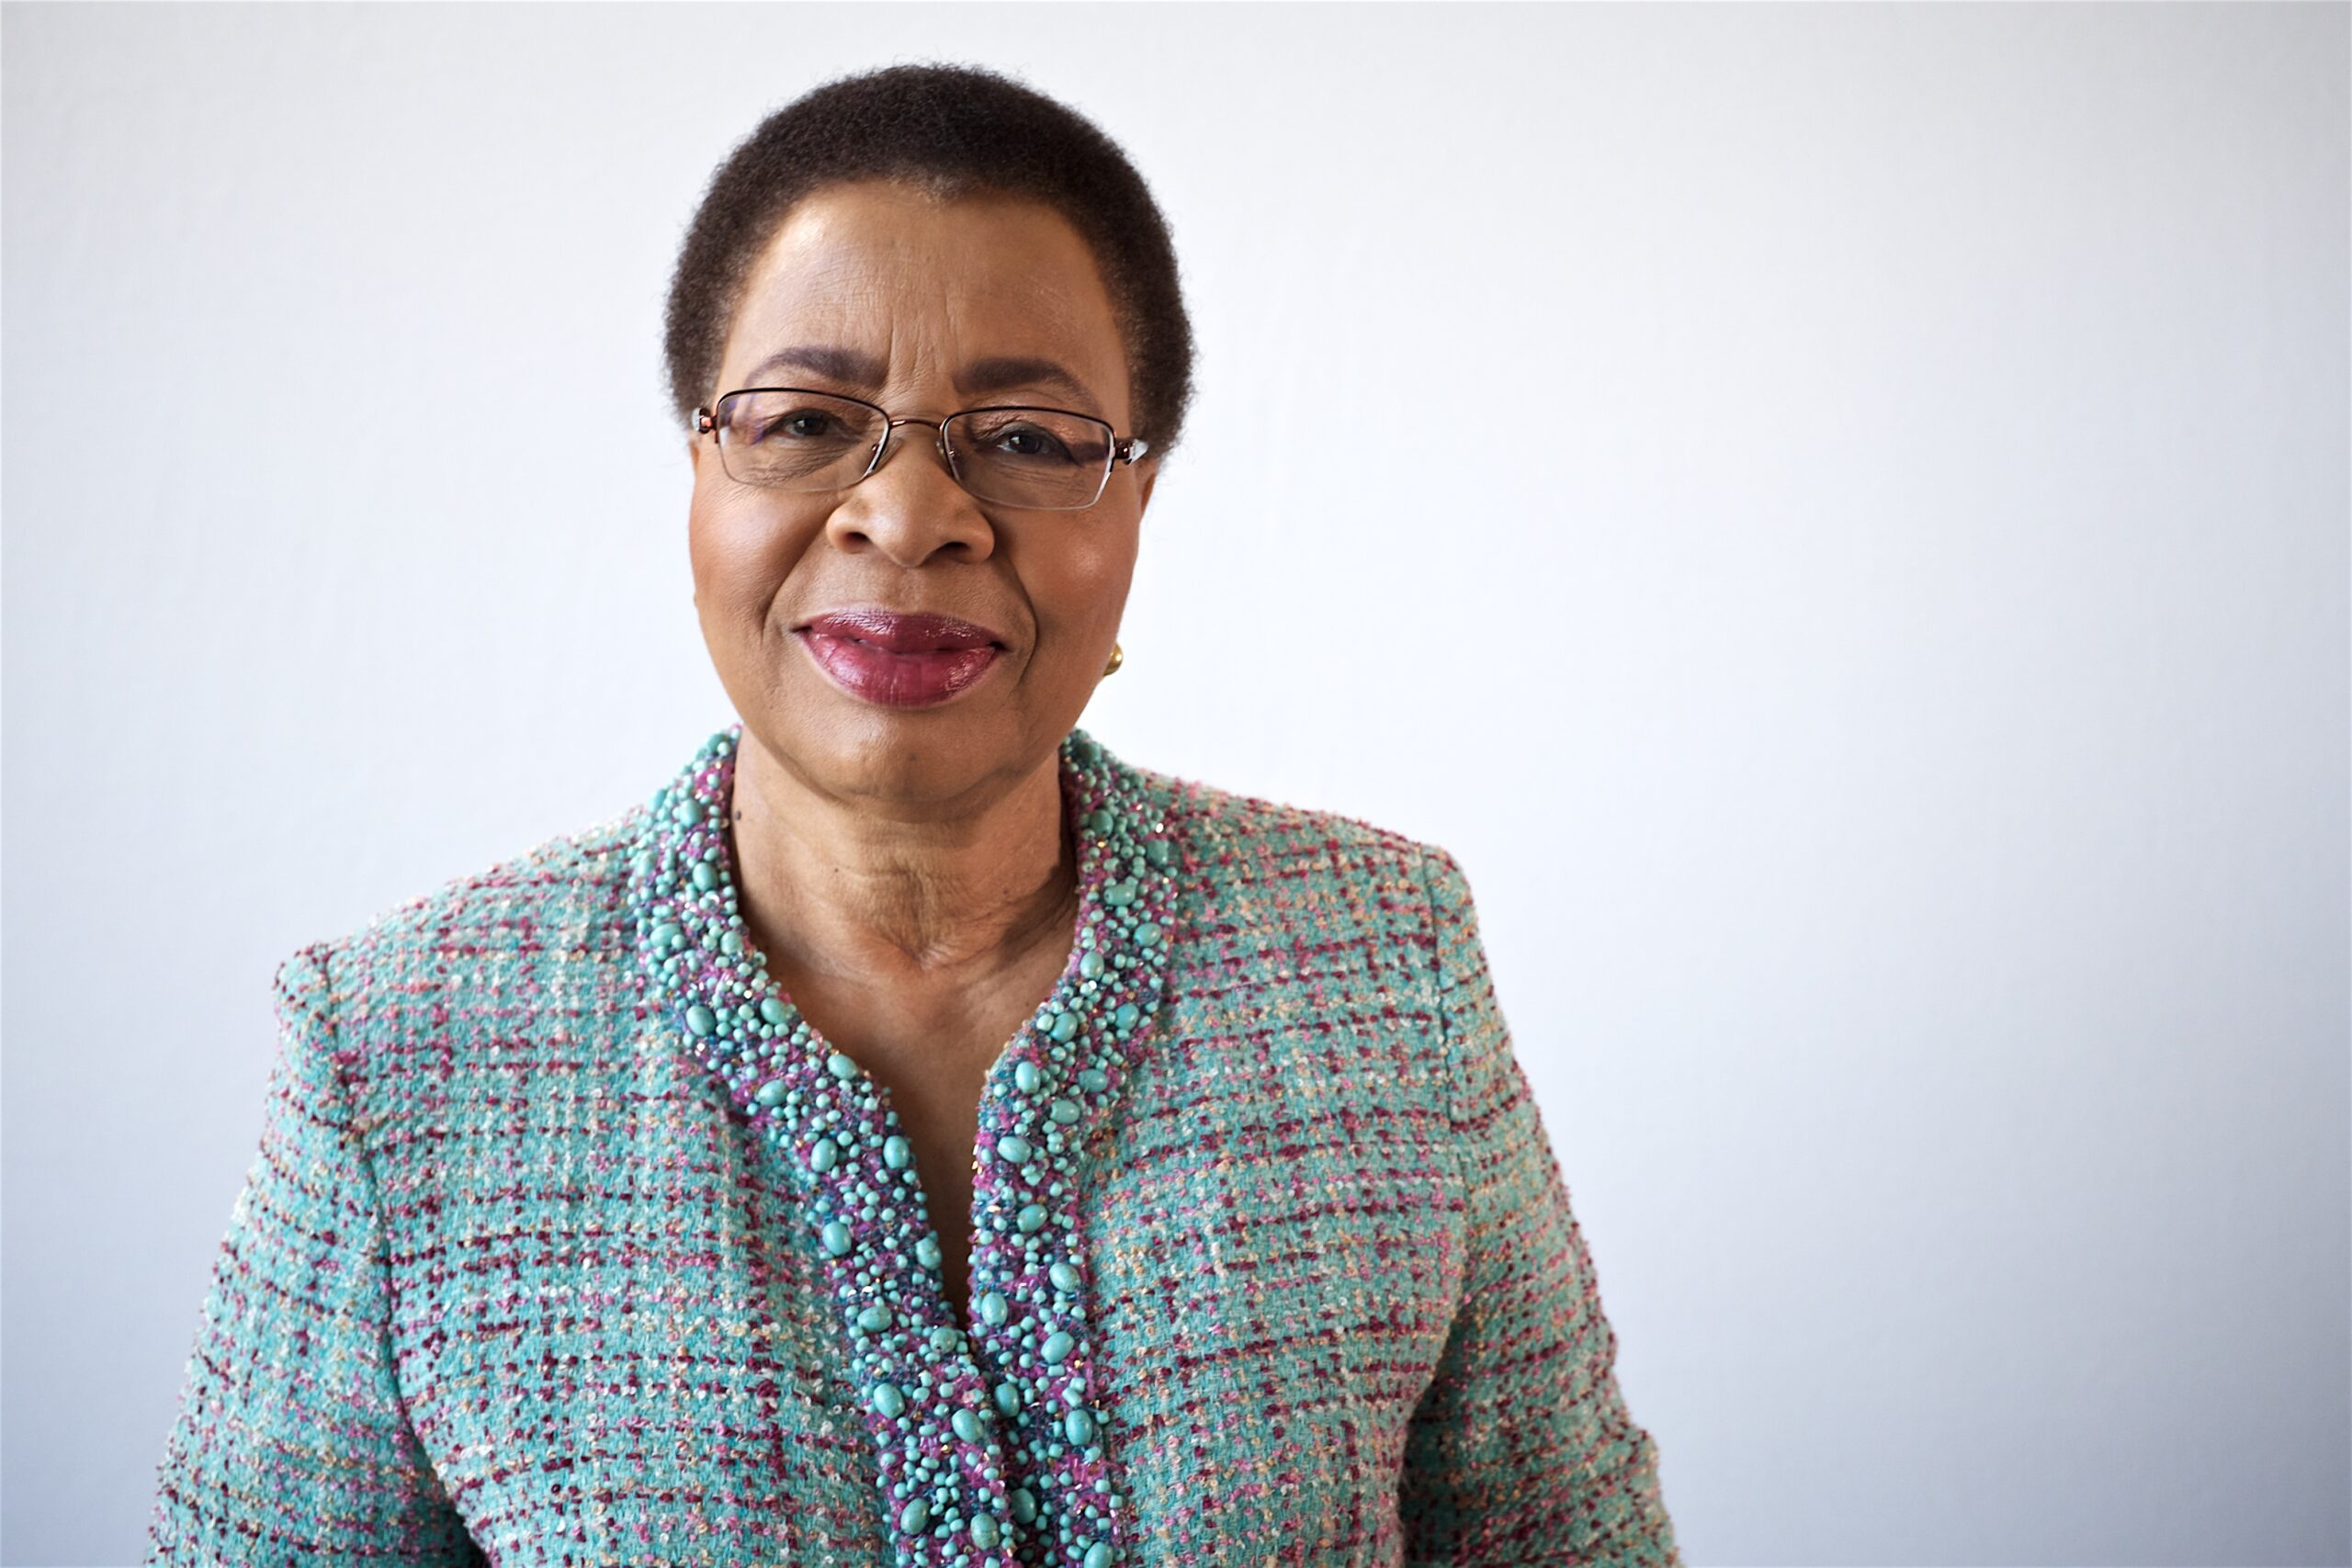 Mrs Graça Machel, Founder, Graça Machel Trust and the Foundation for Community Development